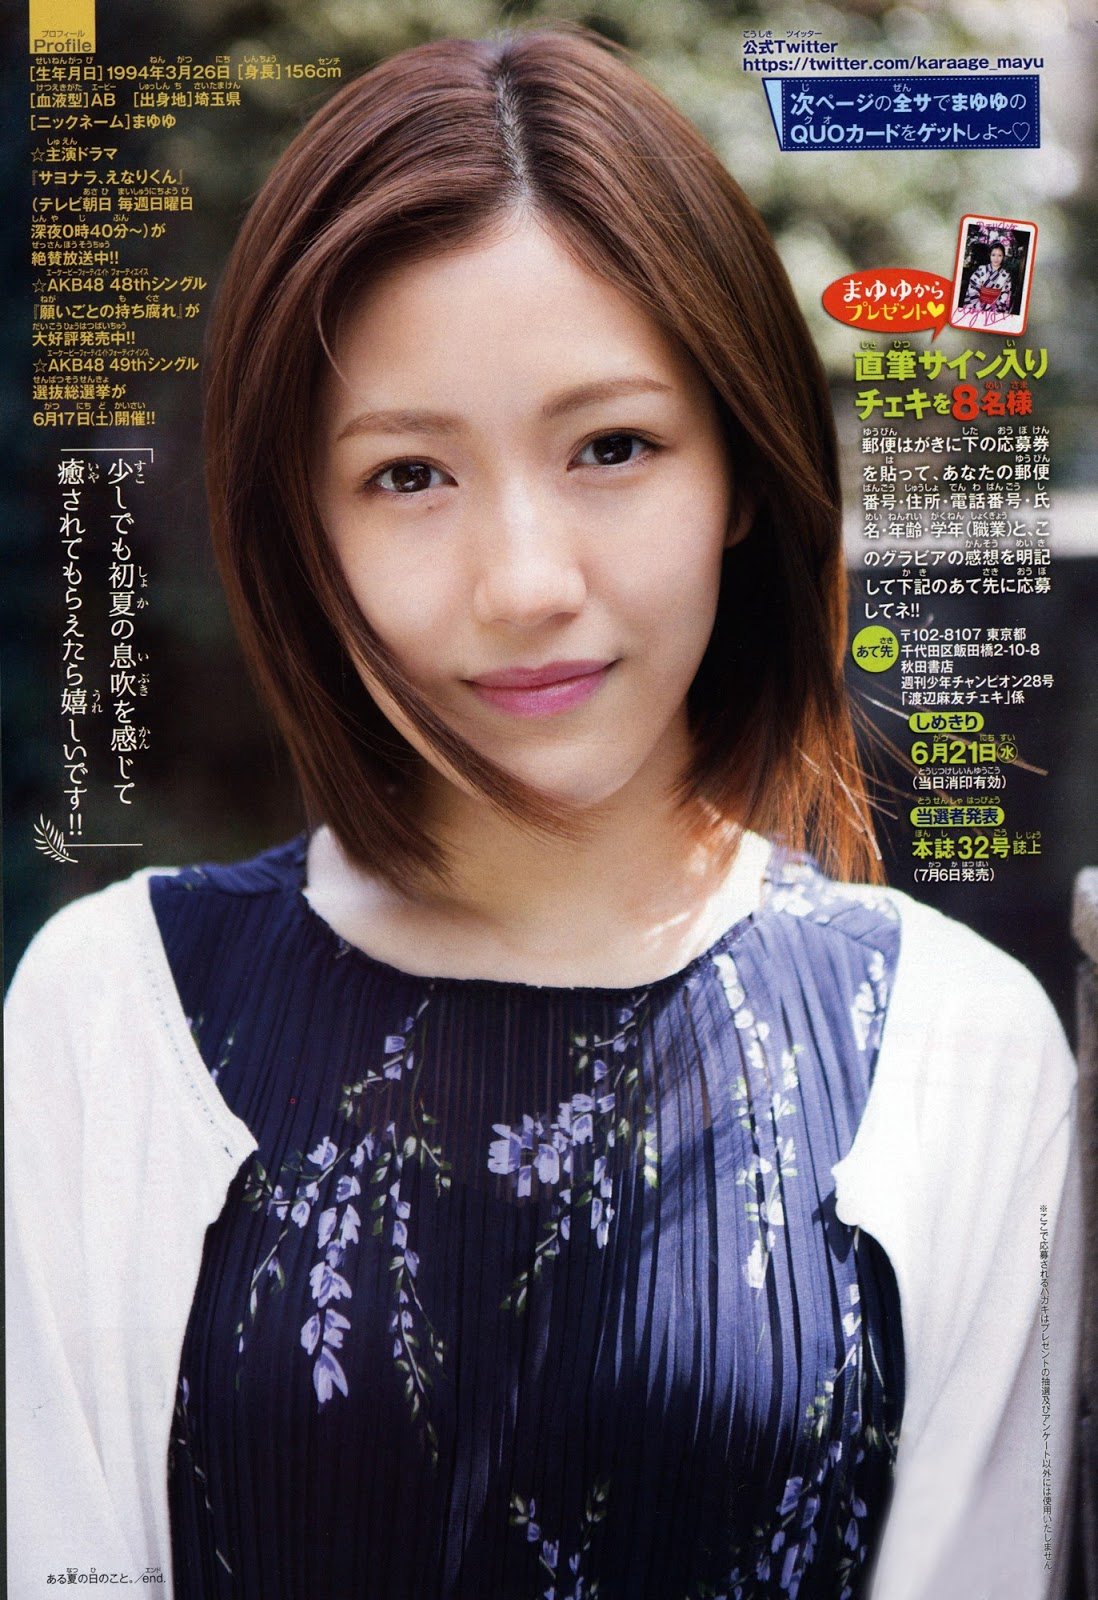 Watanabe Mayu 渡辺麻友 AKB48, Shonen Champion 2017.06.22 No.28 (週刊少年チャンピオン 2017年28号)